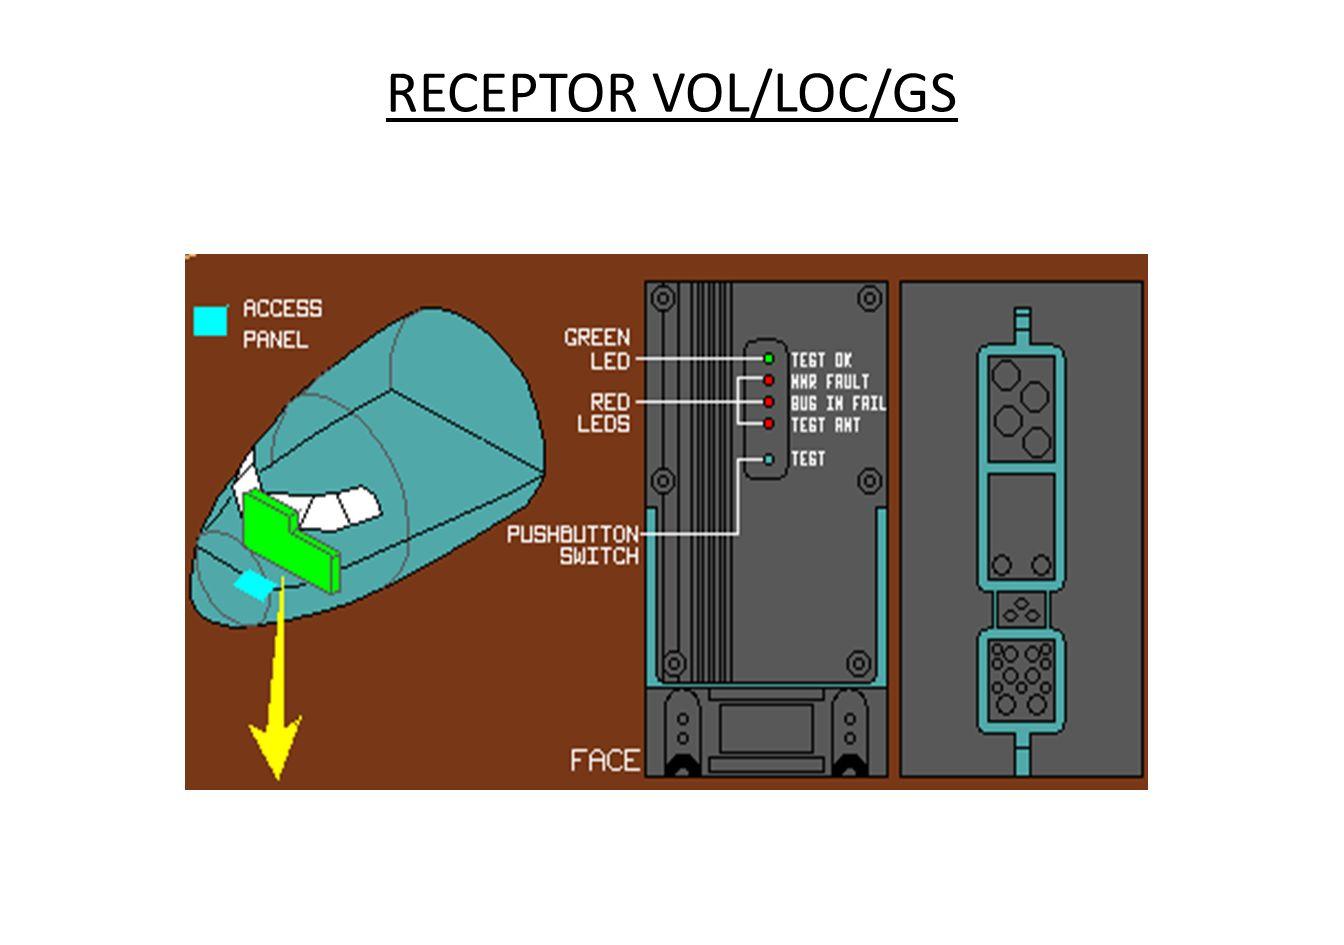 RECEPTOR VOL/LOC/GS